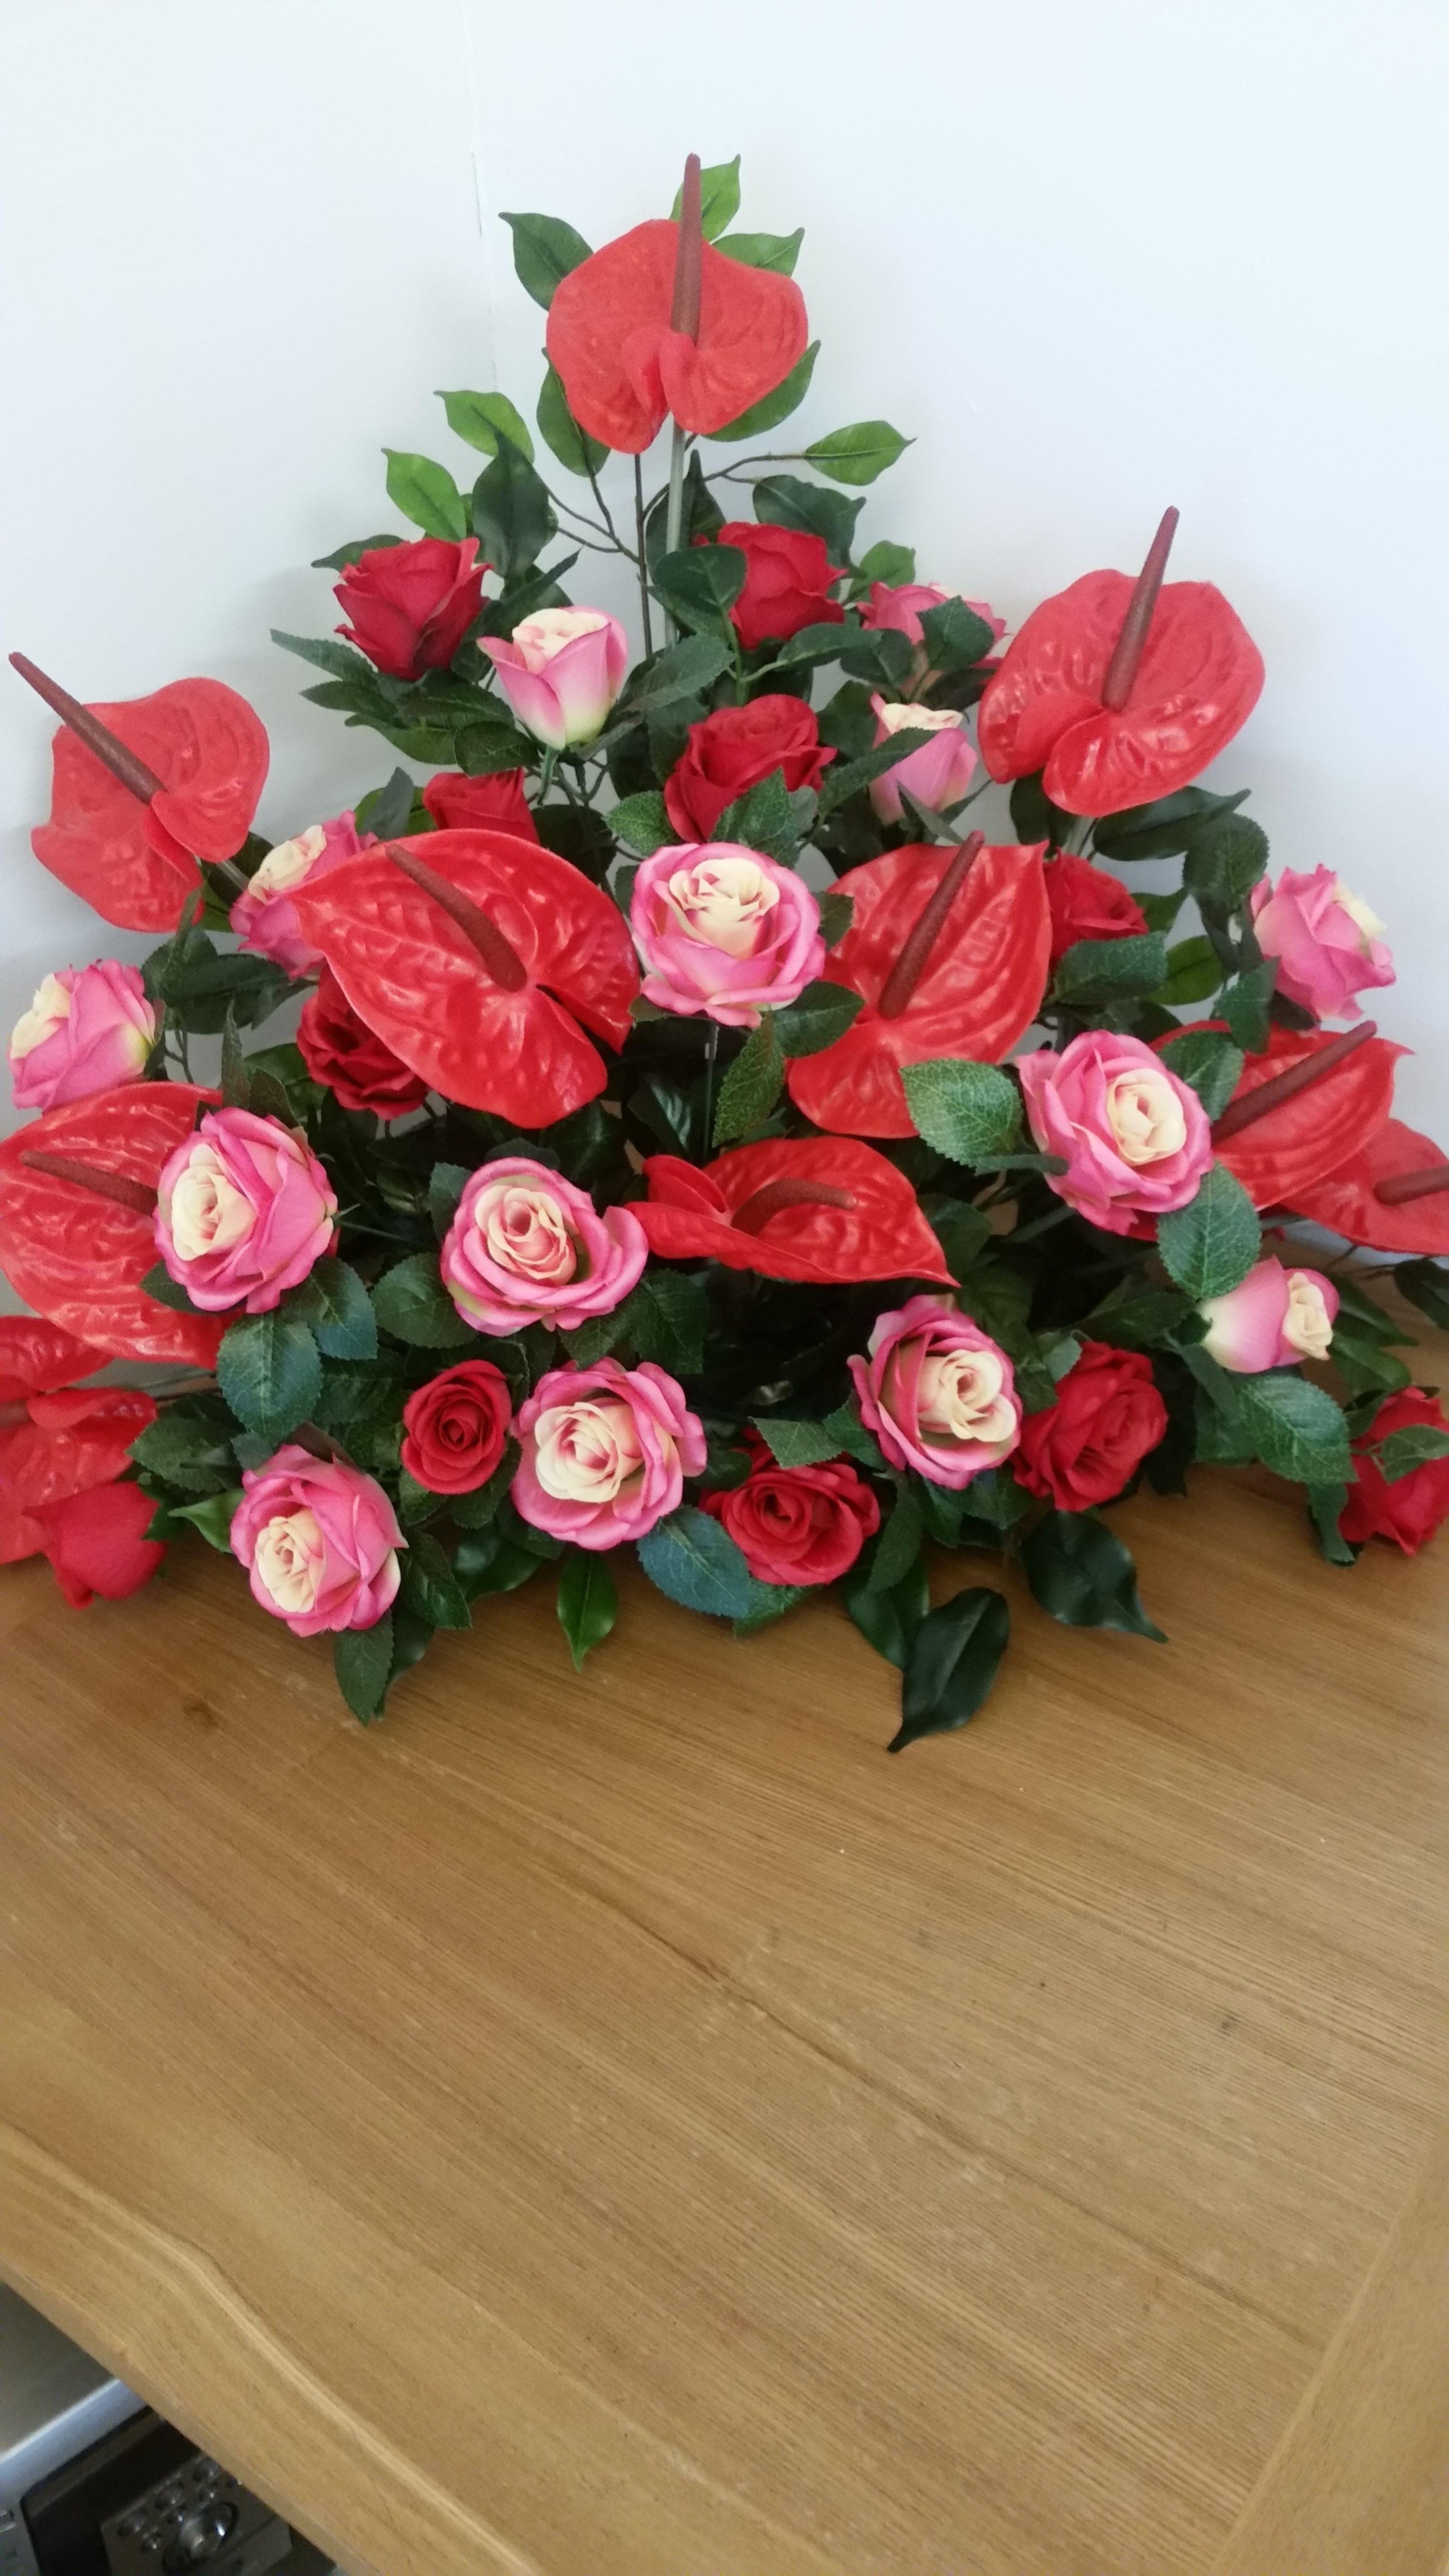 Silk flowers for hire crimson rose weddings pinterest rose silk flowers for hire mightylinksfo